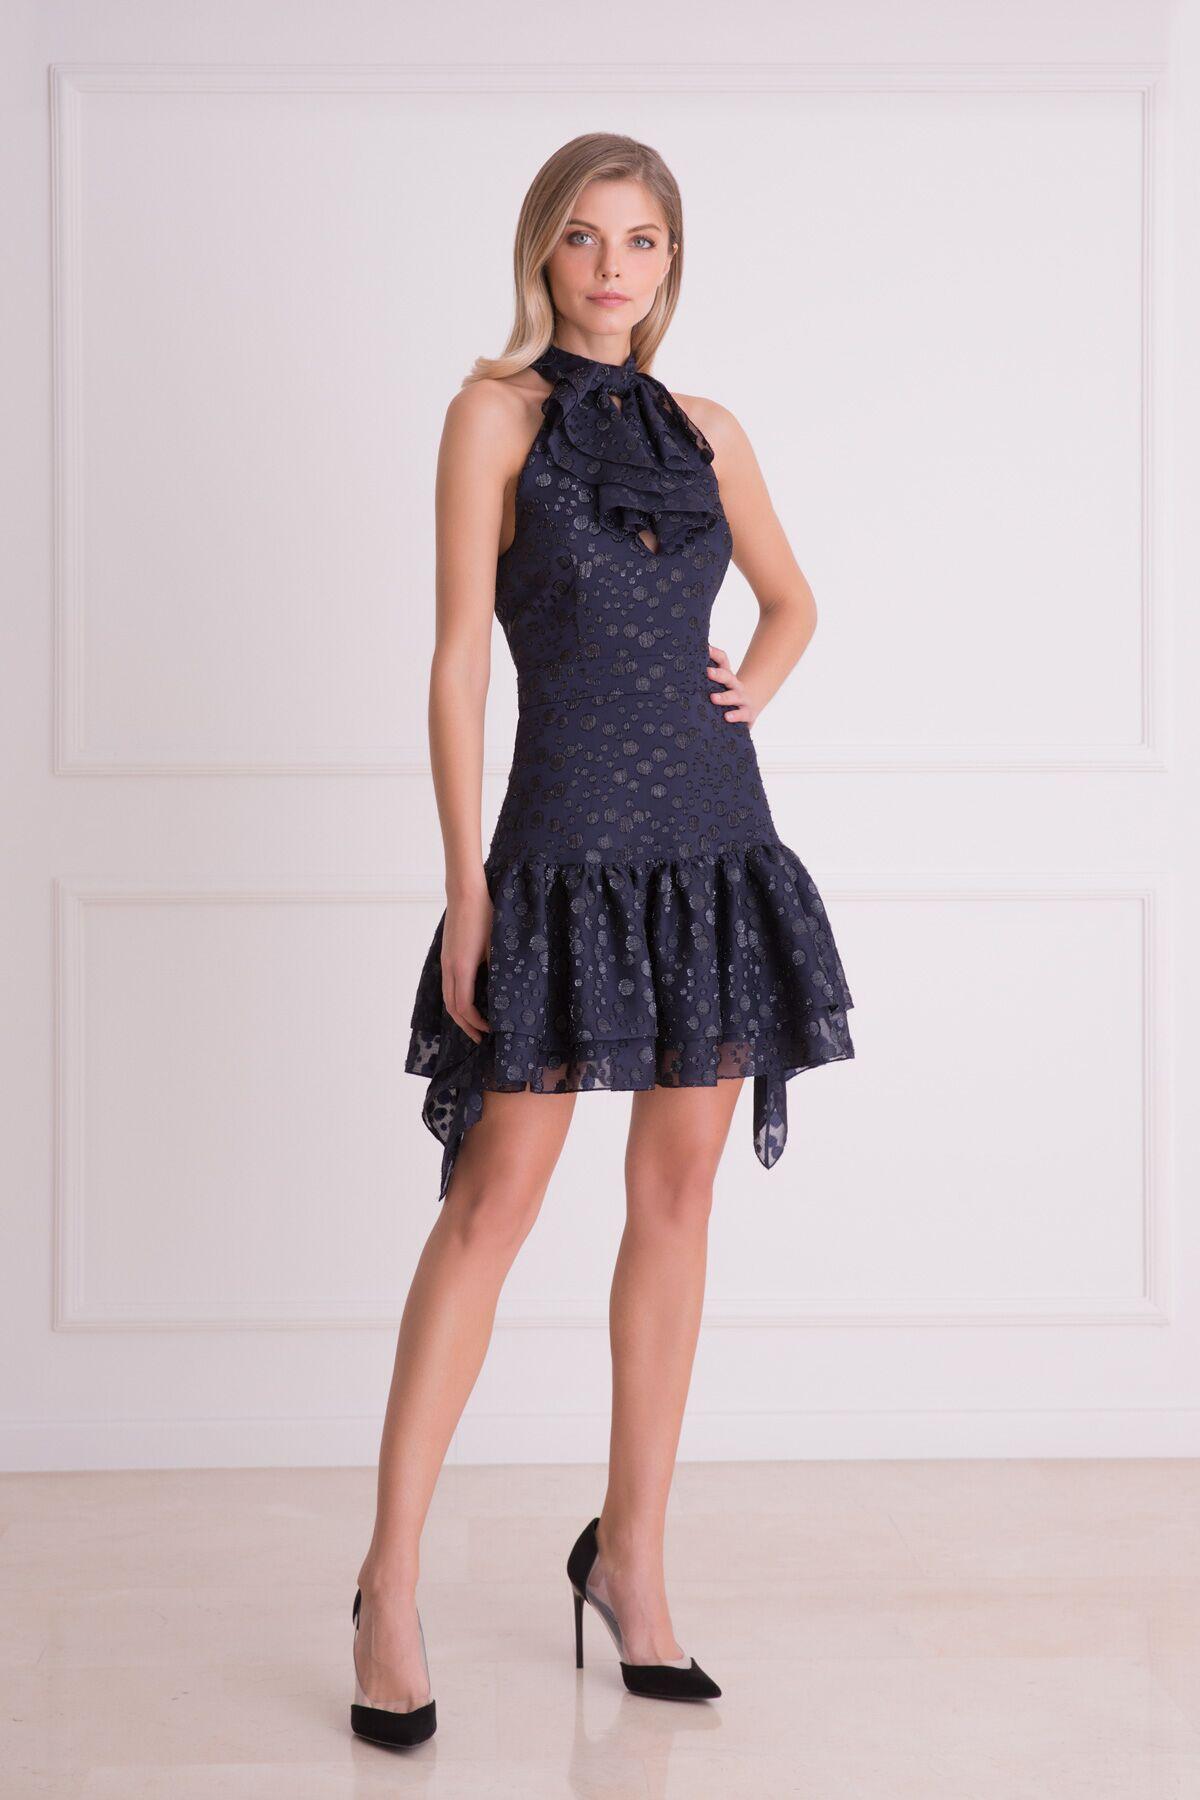 GIZIA - Fular Detaylı Lacivert Mini Elbise